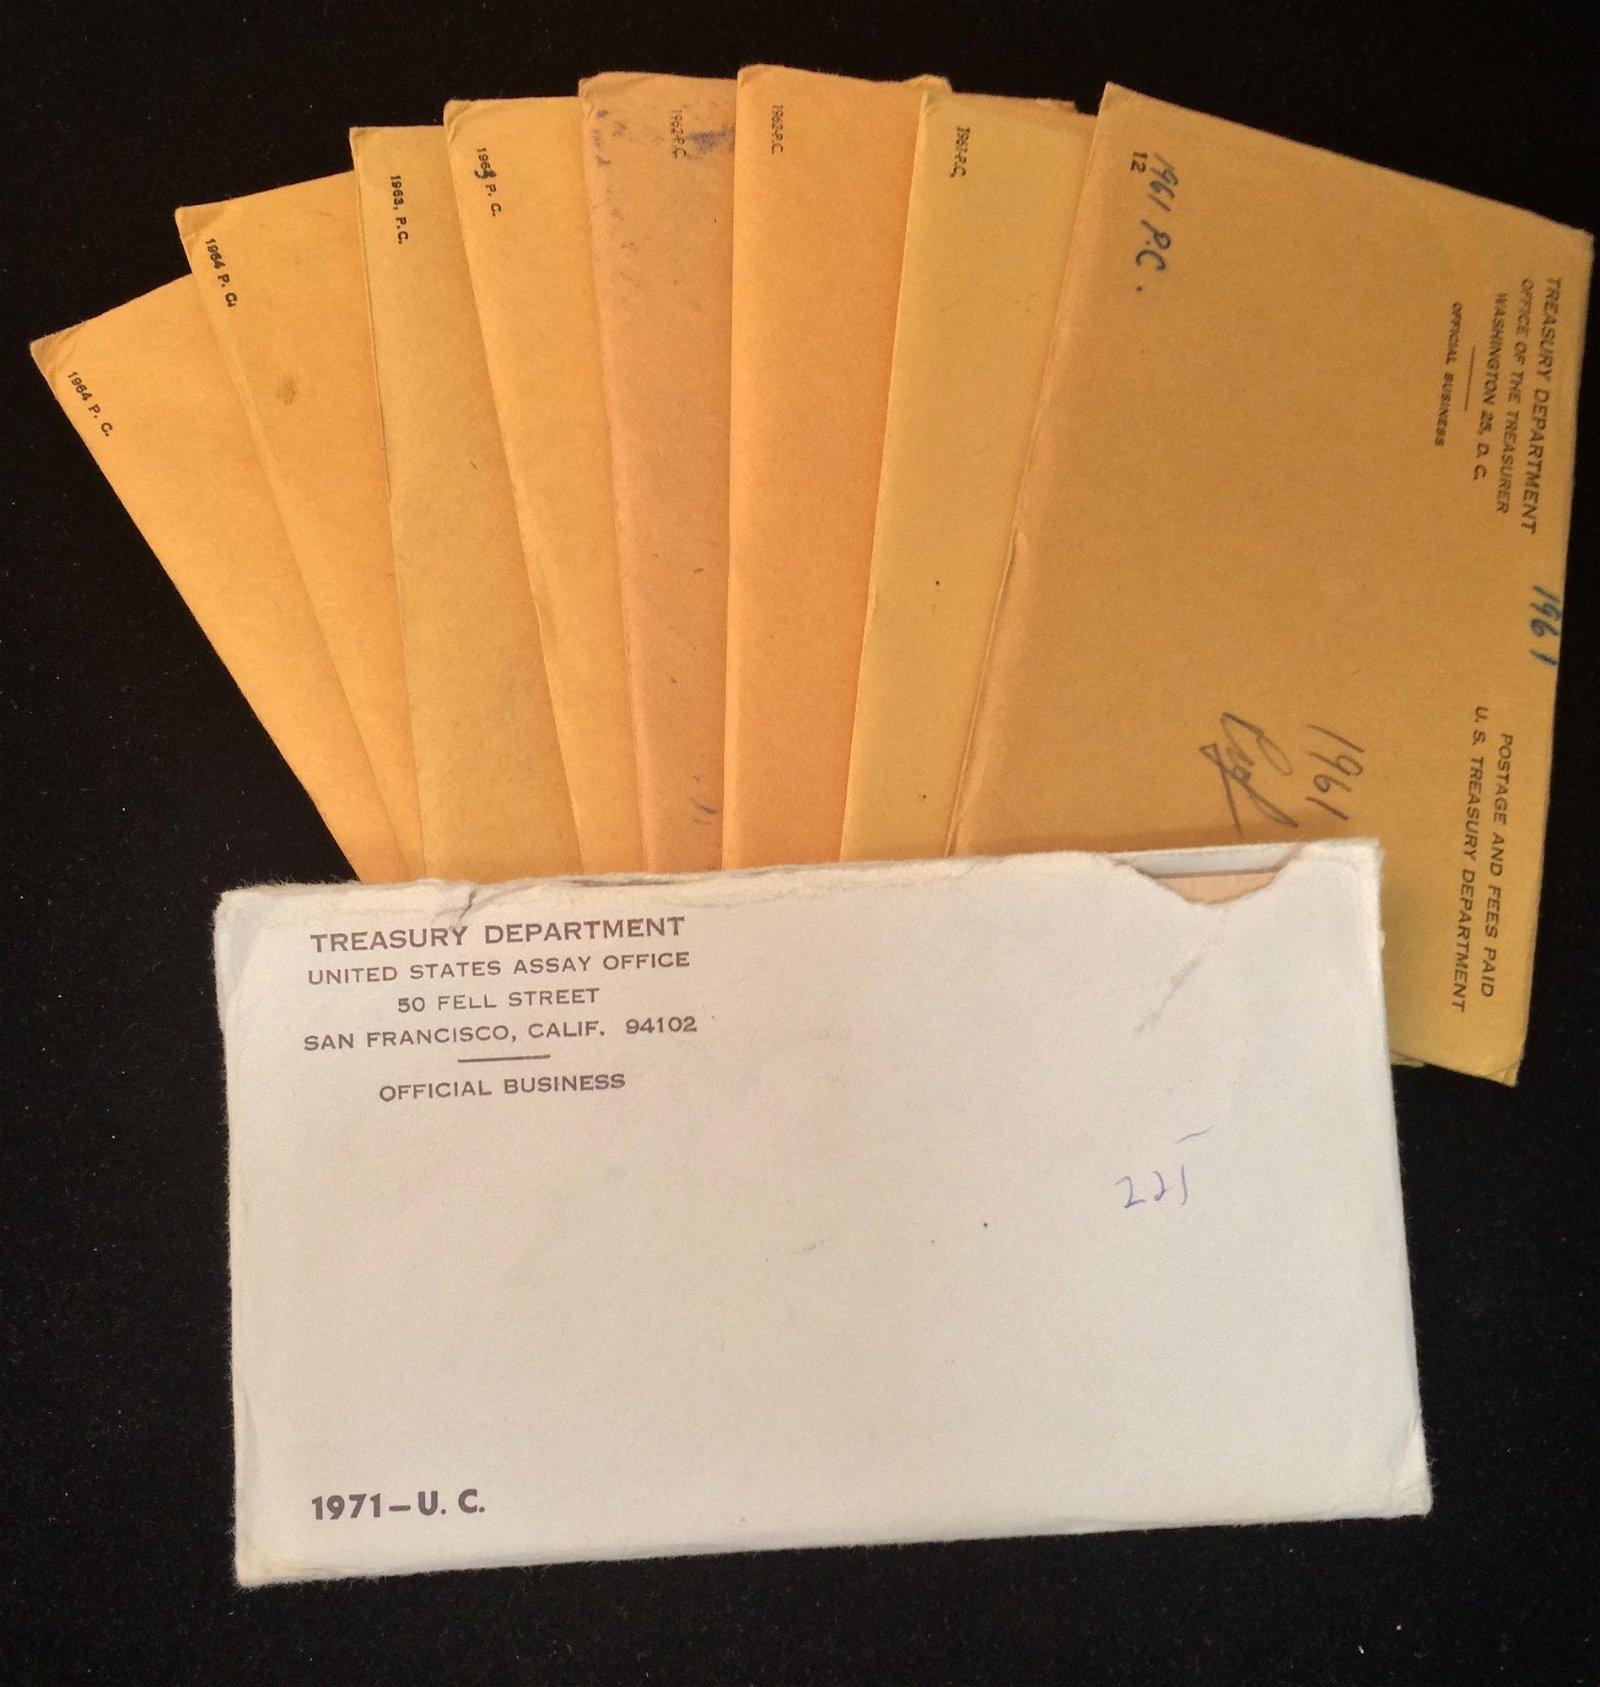 8 U.S. MINT SETS INCLUDING (2) 1961, (2) 1962, (2)